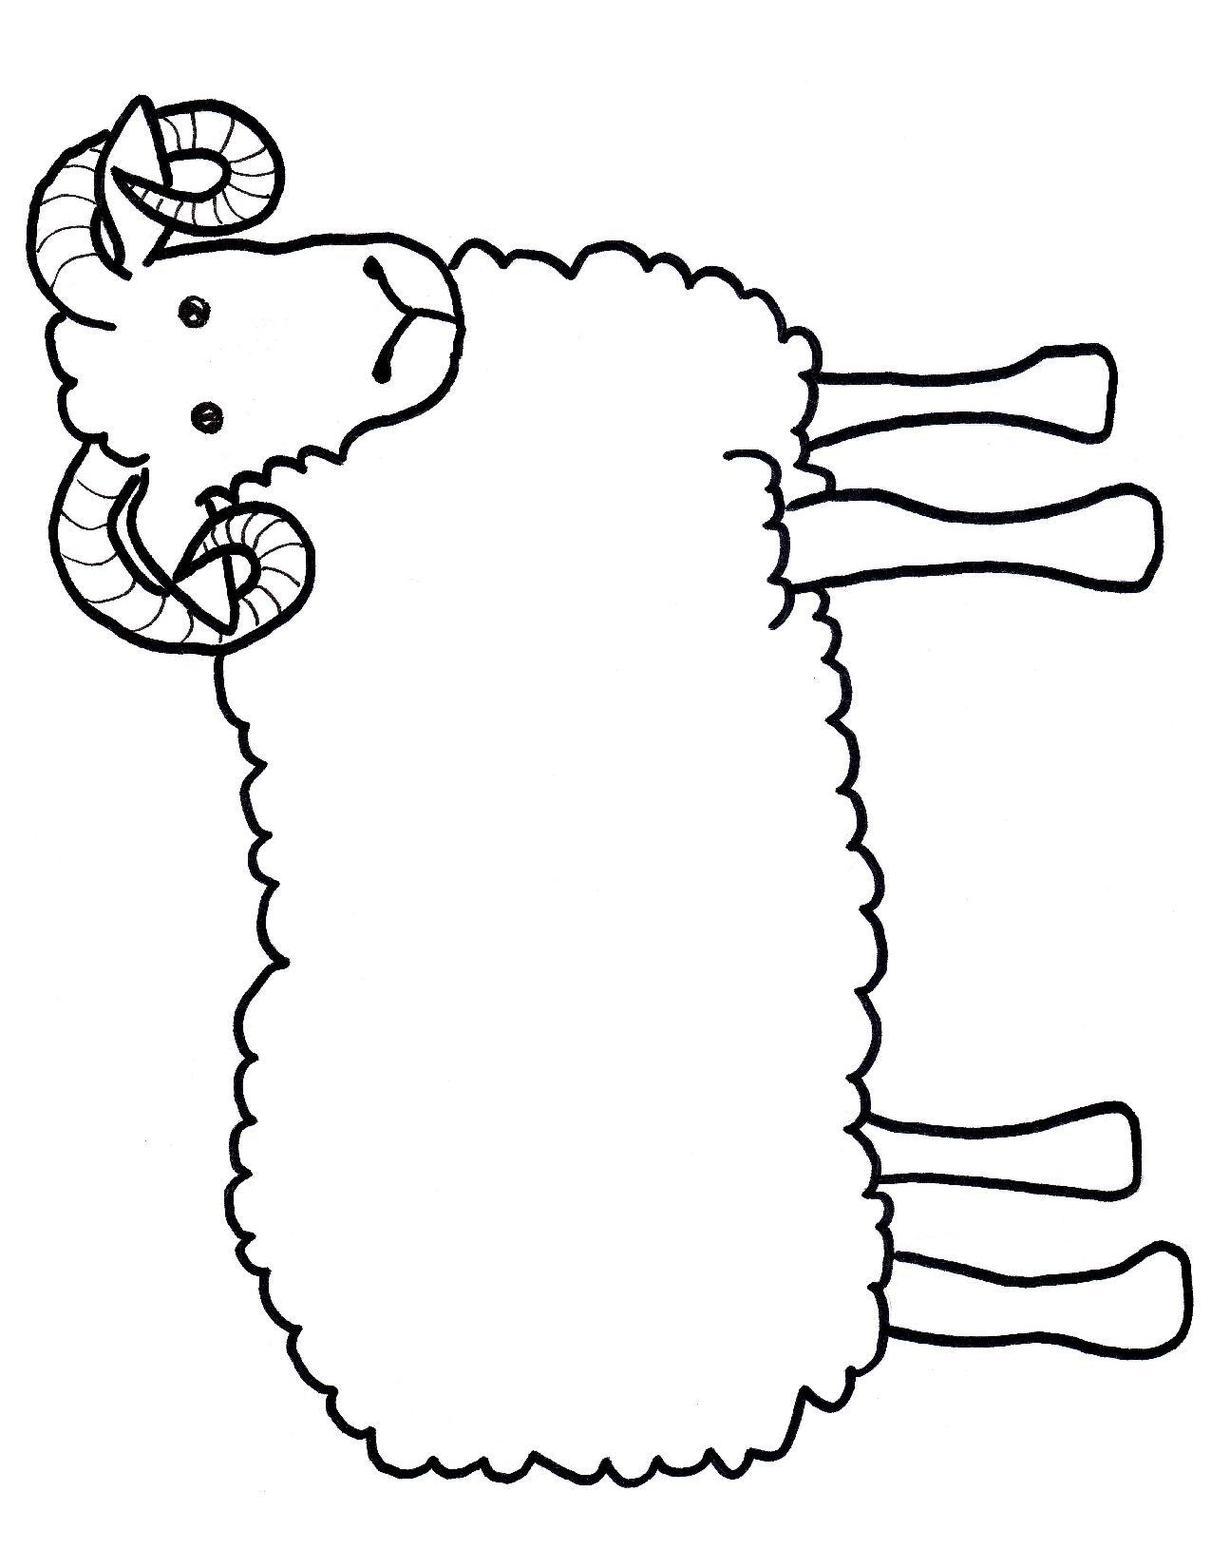 Sheep clipart ram #10